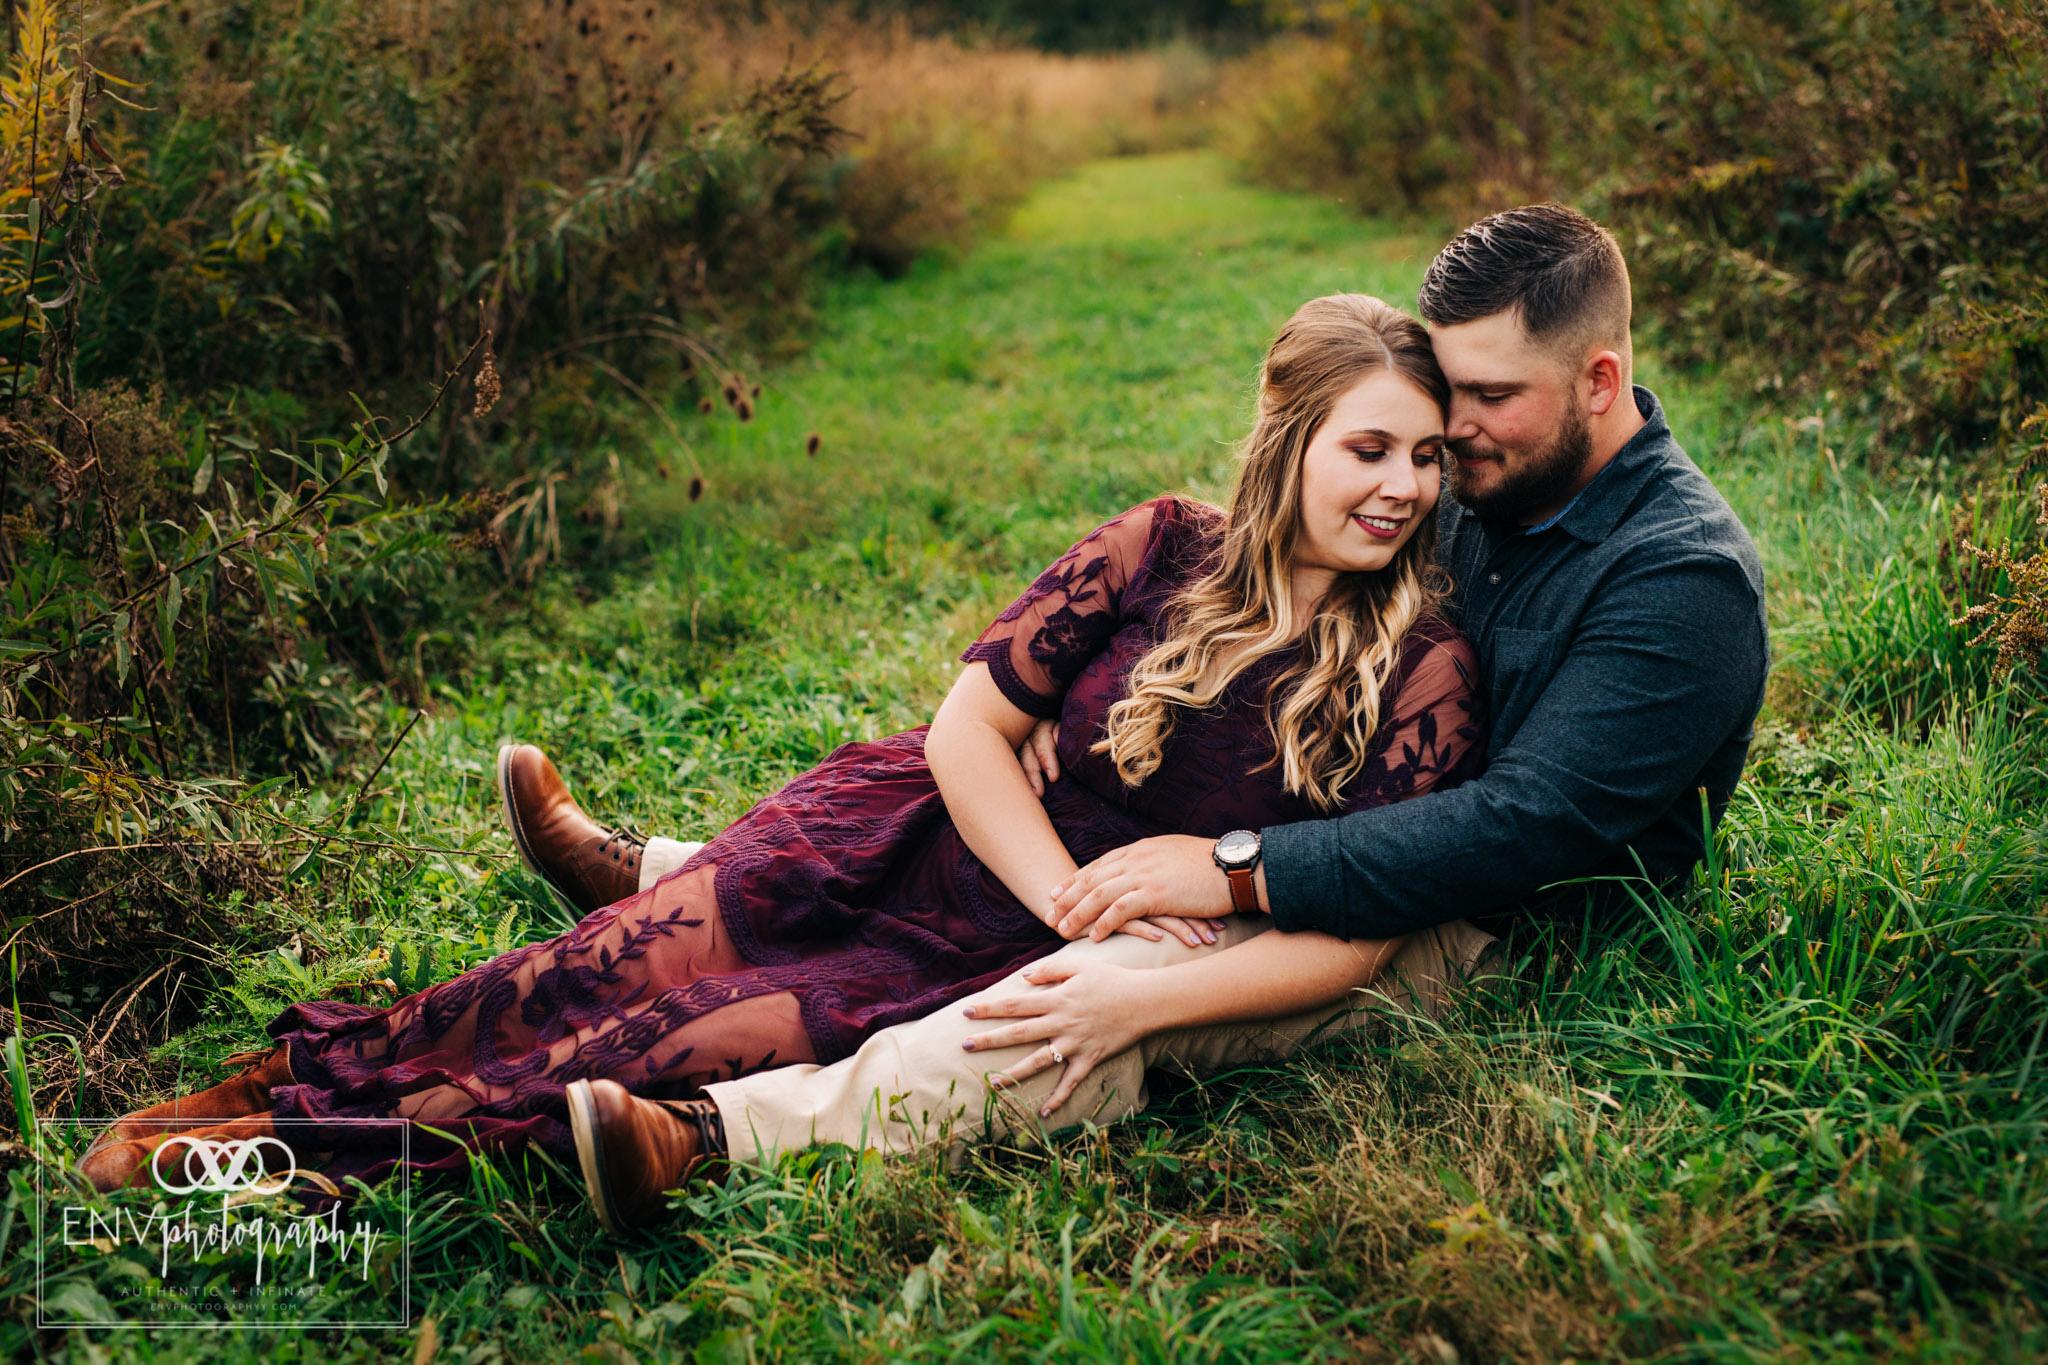 columbus ohio mount vernon ohio engagement photographer 2018 (2).jpg